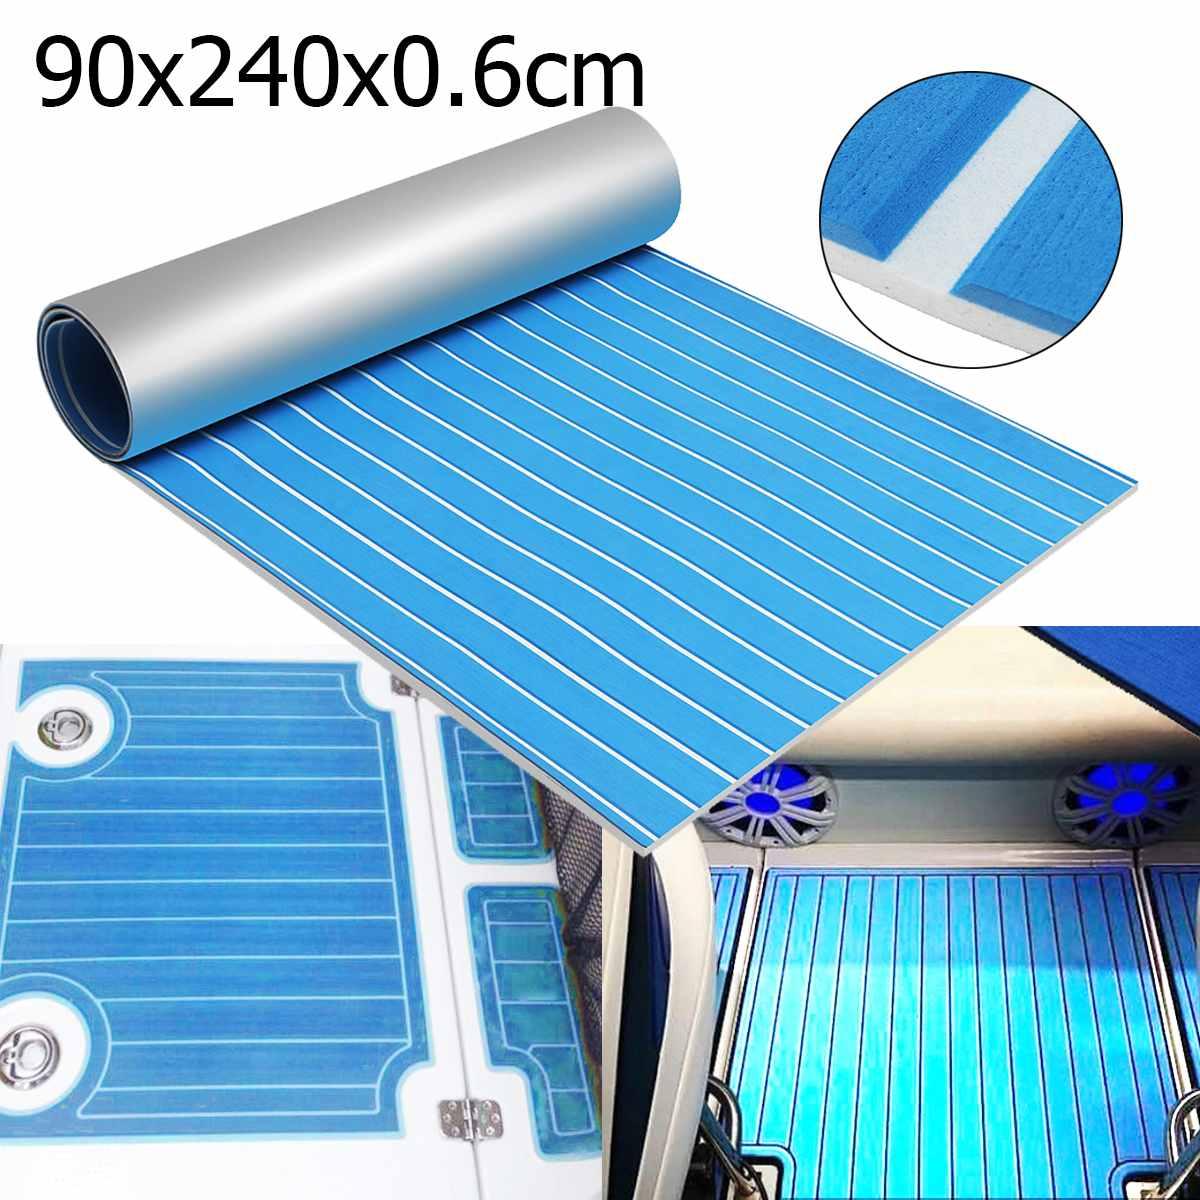 Self-adhesive EVA Foam Teak Sheet Boat Yacht Synthetic Decking 0.6cm 90x240cm Foam Floor Mat Blue With White Line Floor Sheet